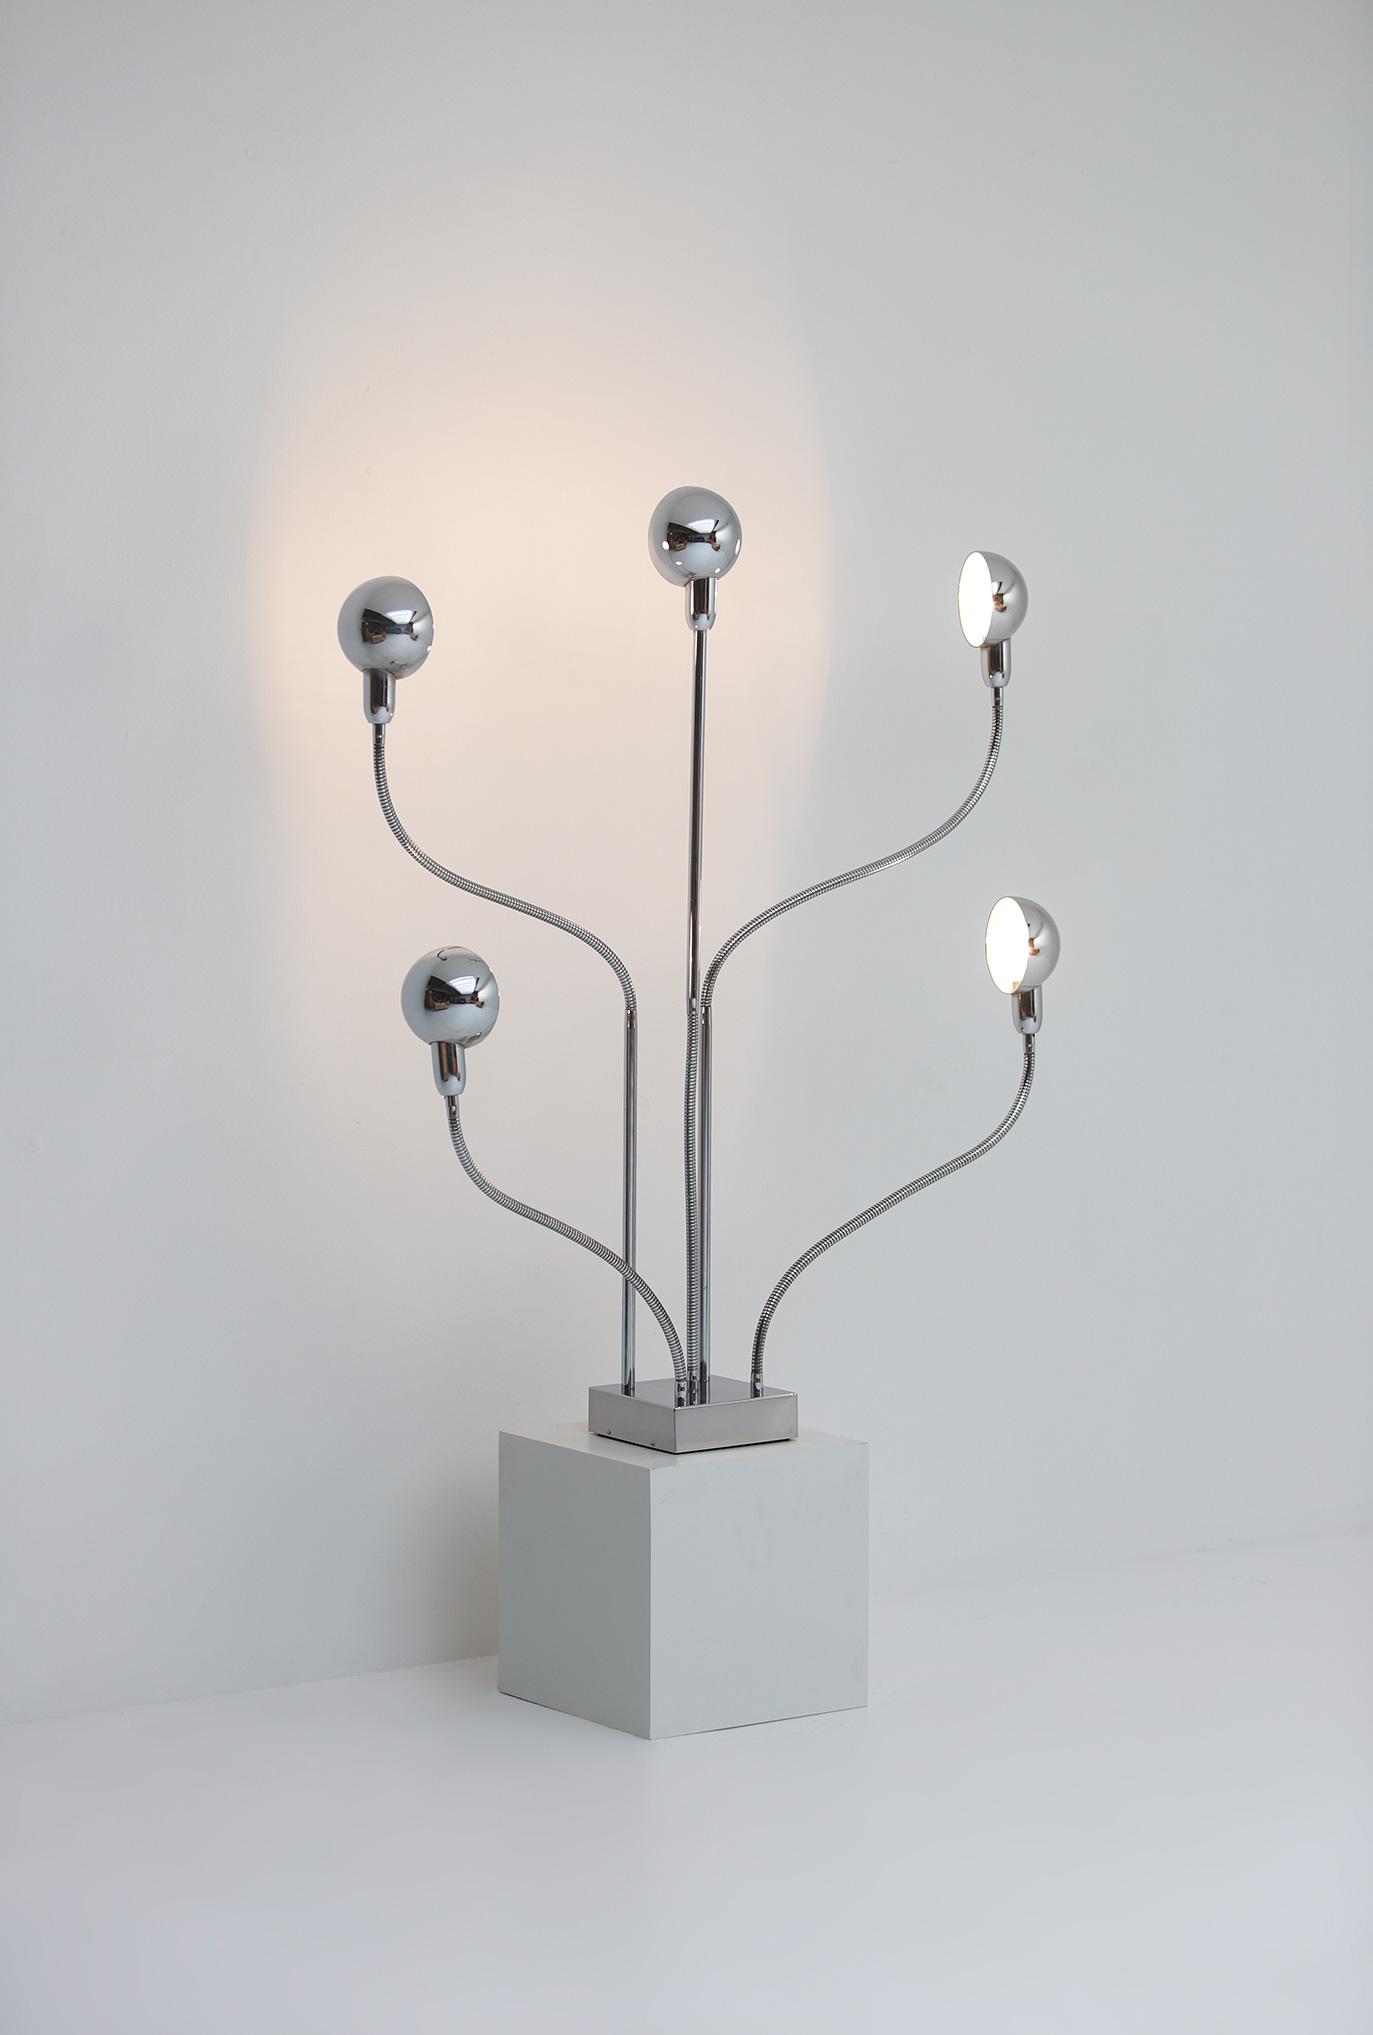 Pierre Folie Hydra floor lamp for Jacques Charpentierimage 8